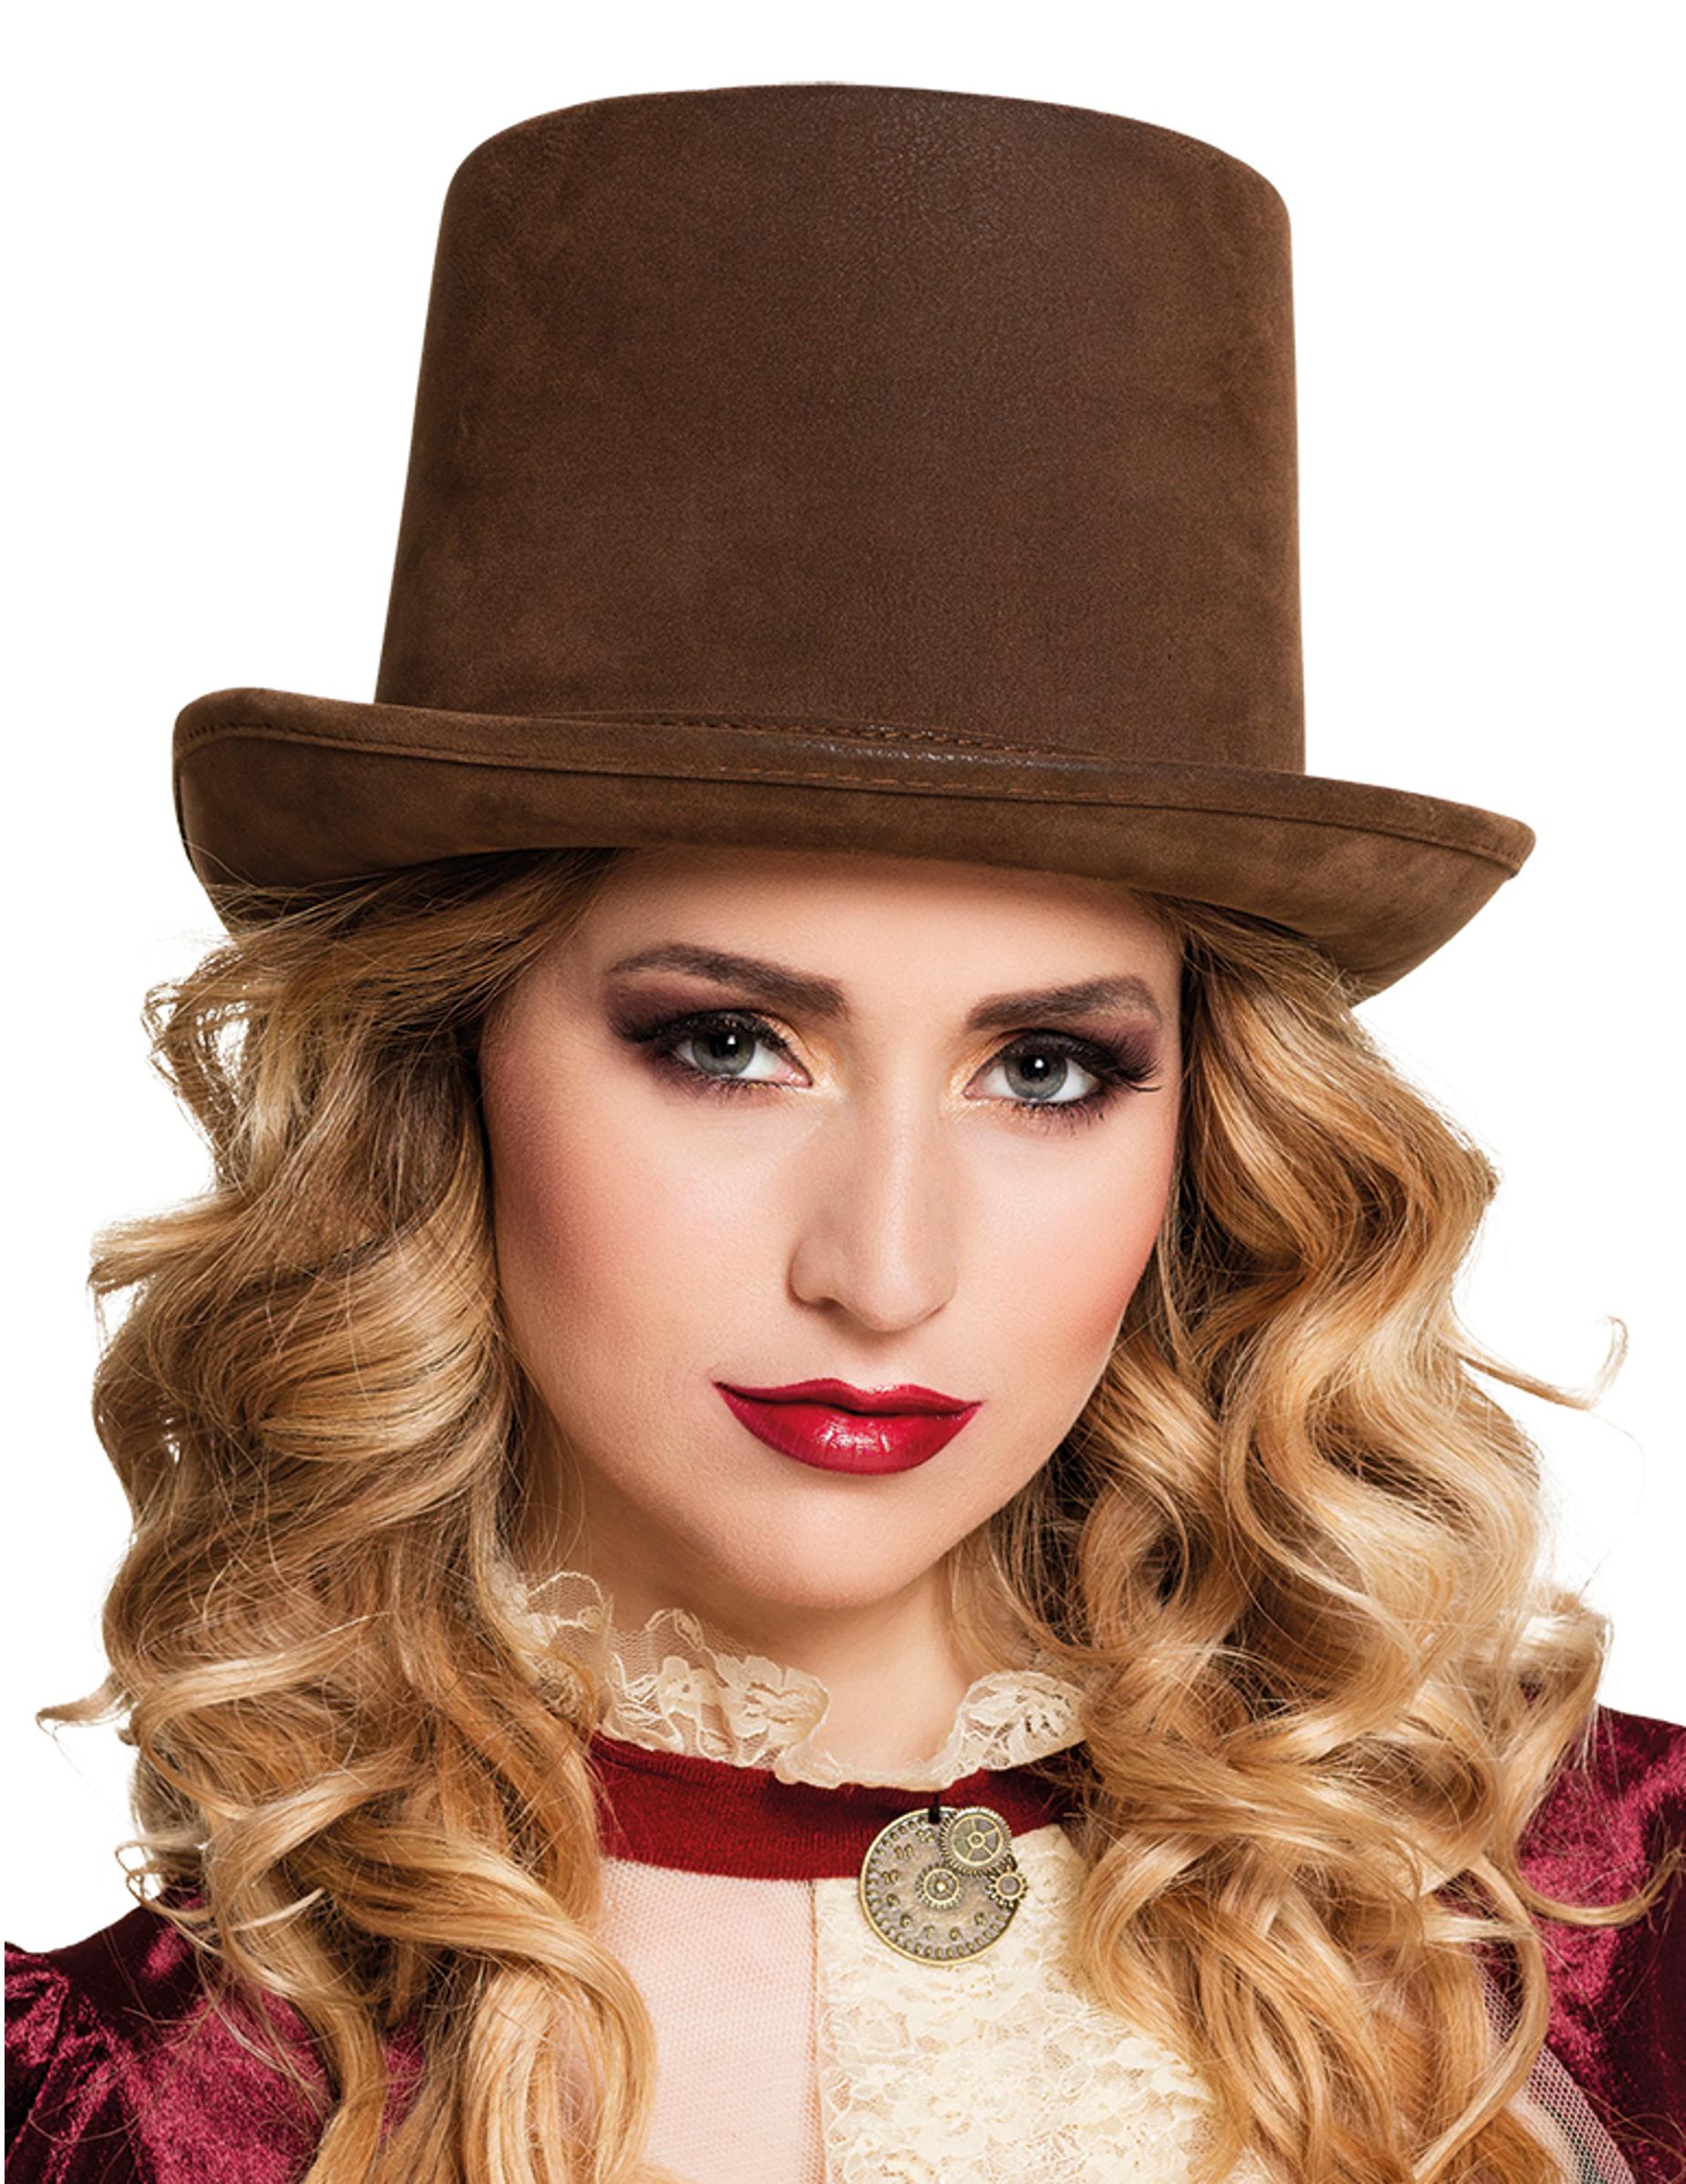 Sombrero de copa marrón adulto Steampunk  Sombreros f8107d490d9